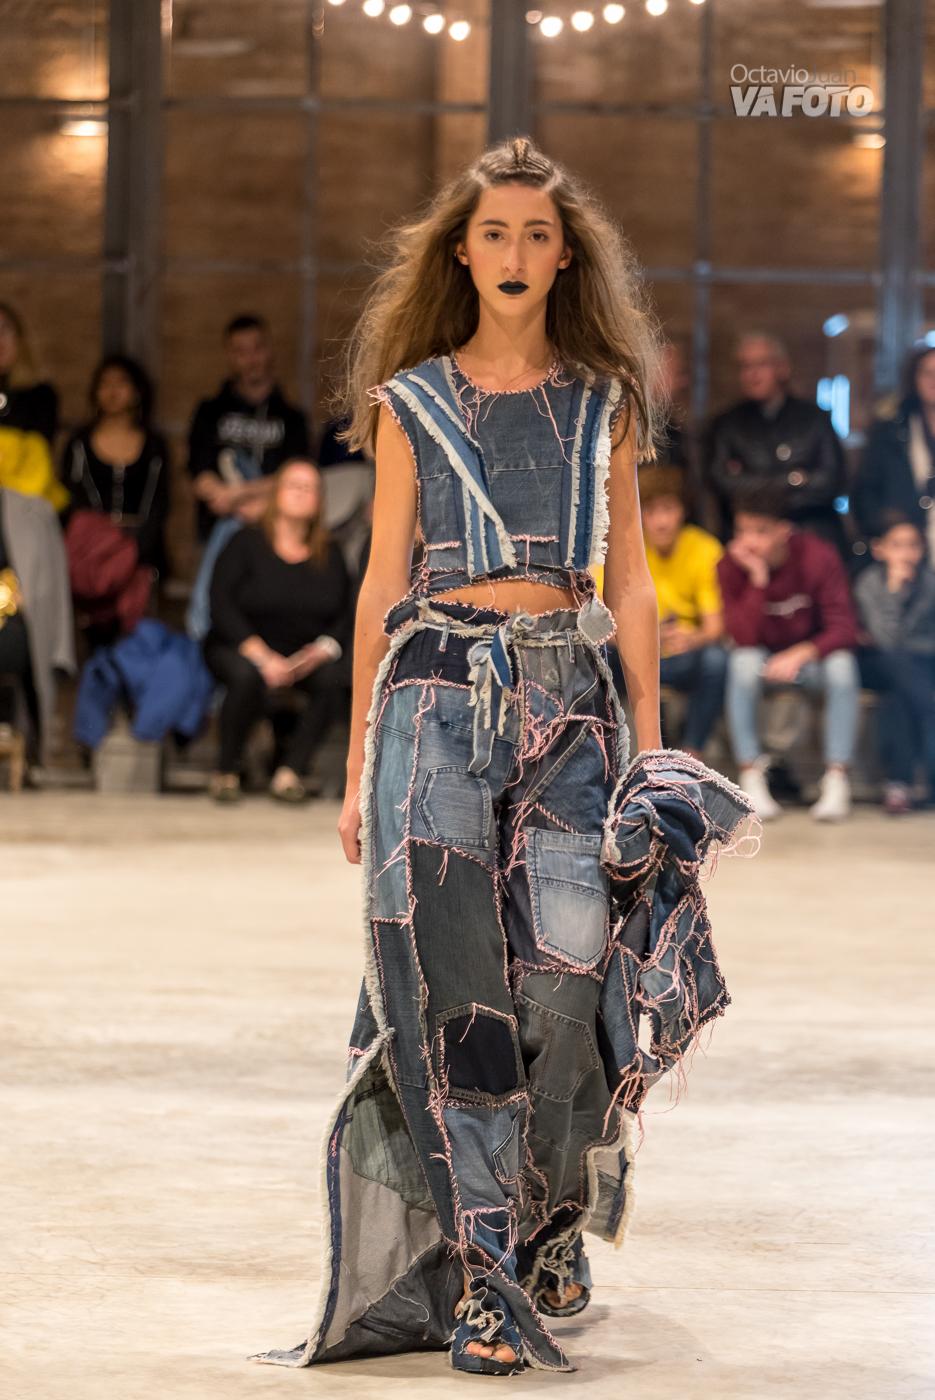 00076 ARTEMODA DSC4175 20181124 - Evento: Arte + Moda Valencia